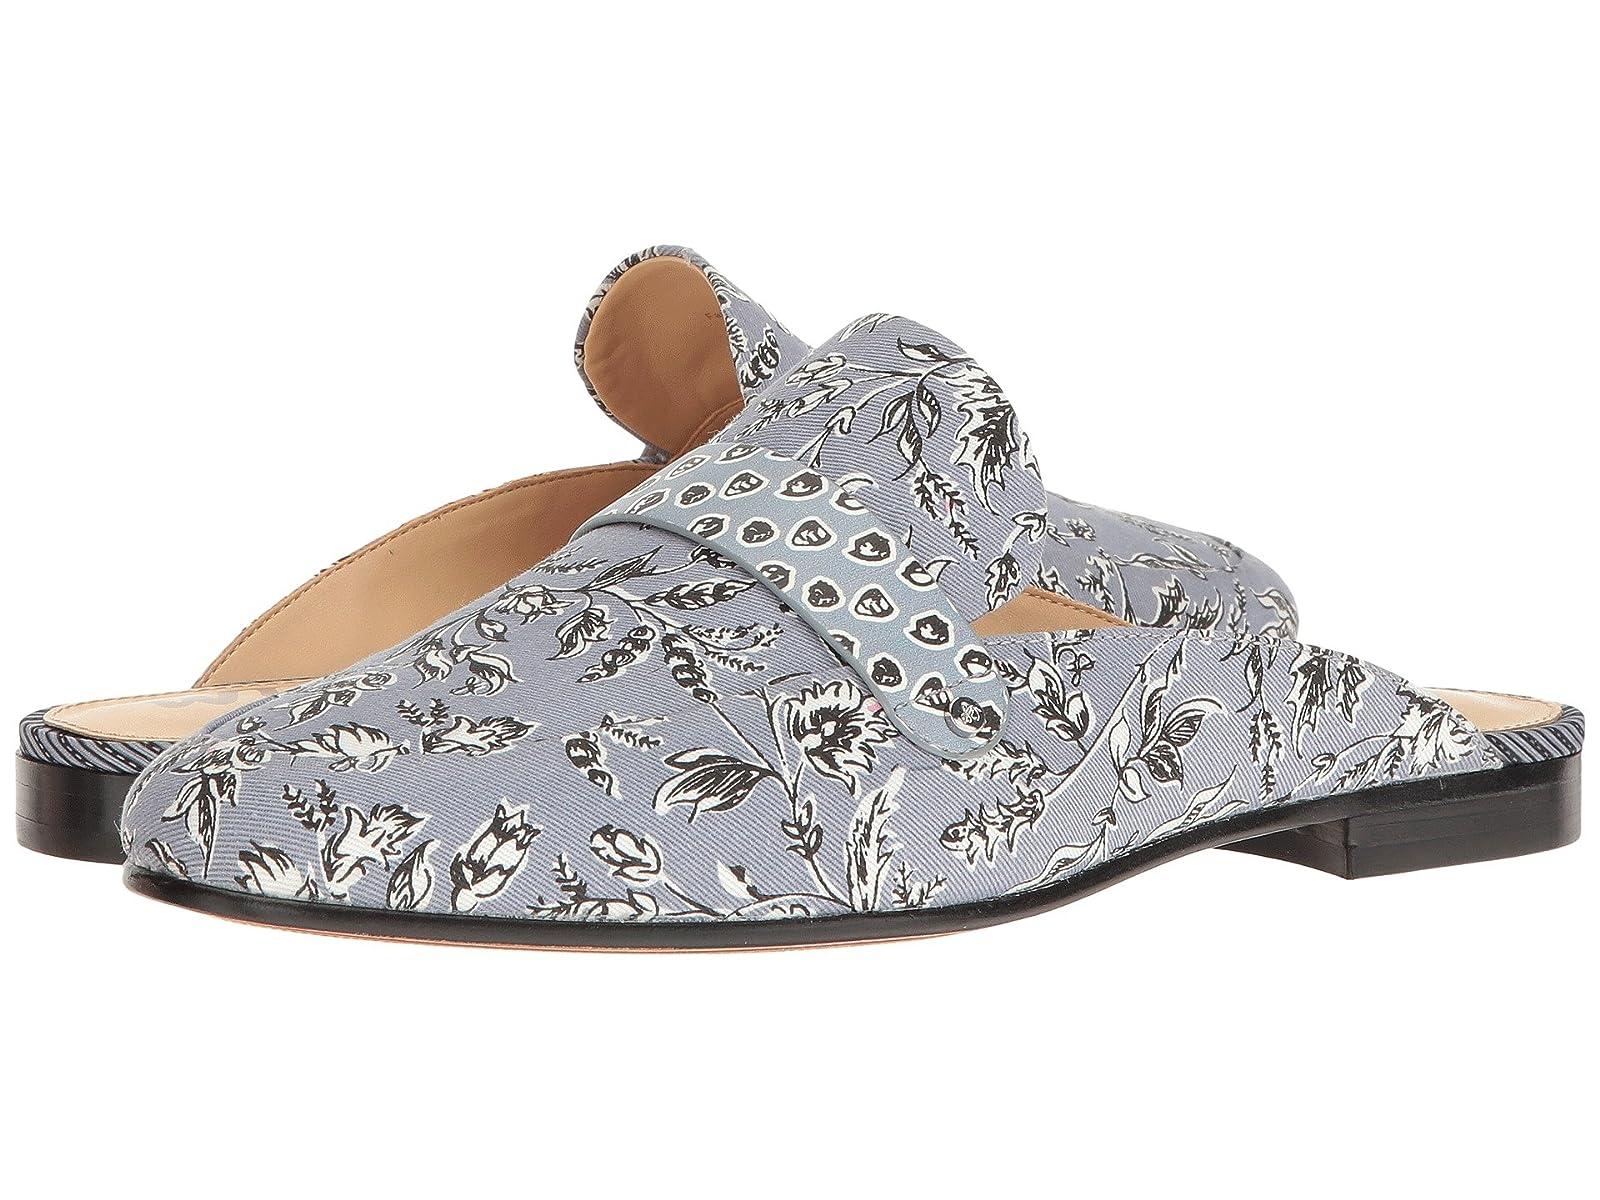 Sam Edelman PerriCheap and distinctive eye-catching shoes